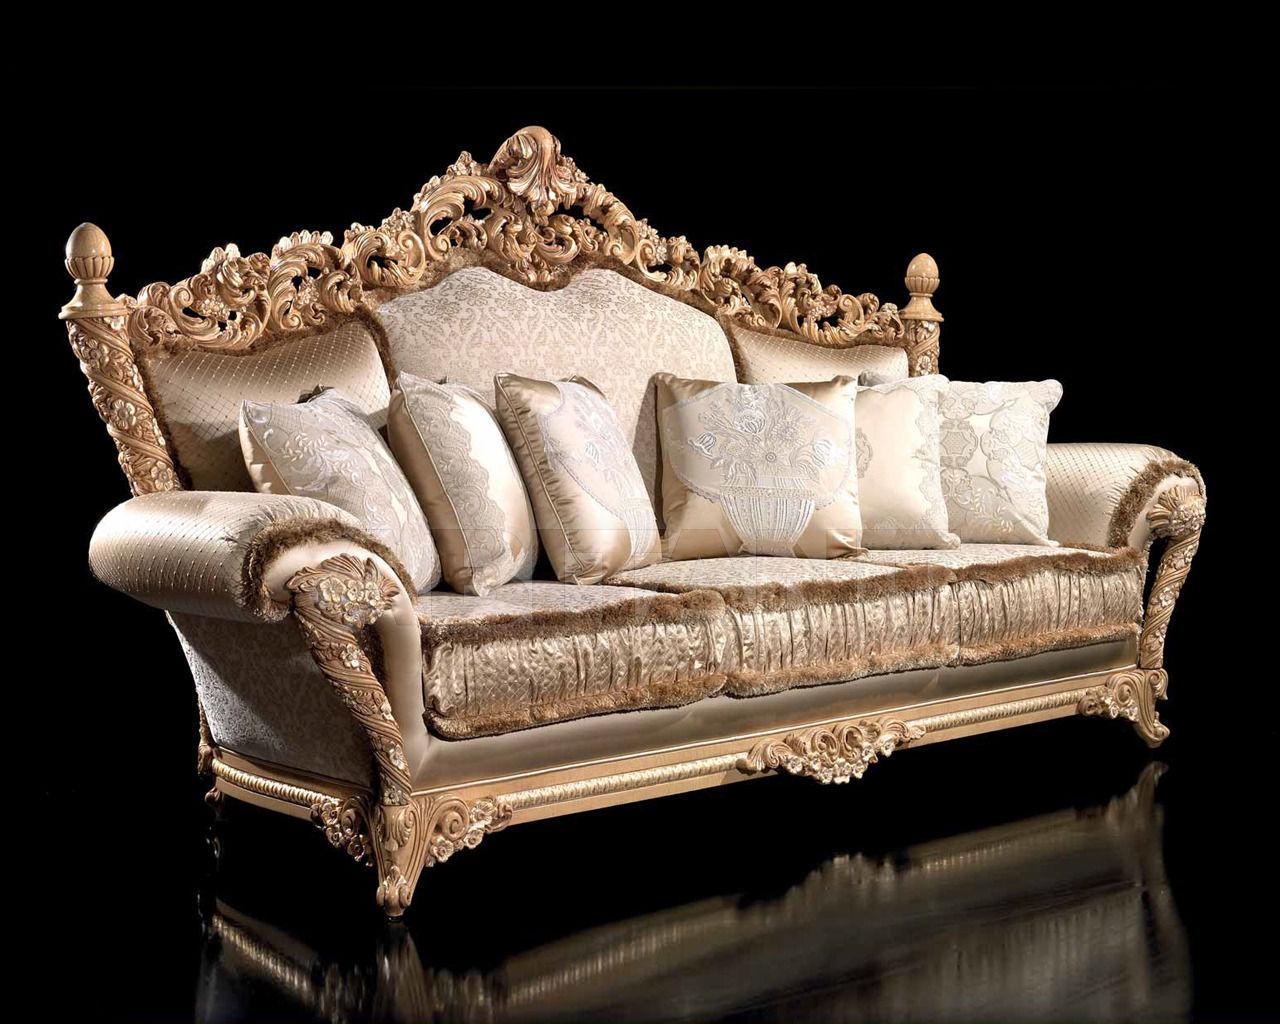 Купить Диван BITOSSI LUCIANO & FIGLI s.n.c. Lady D. 8210